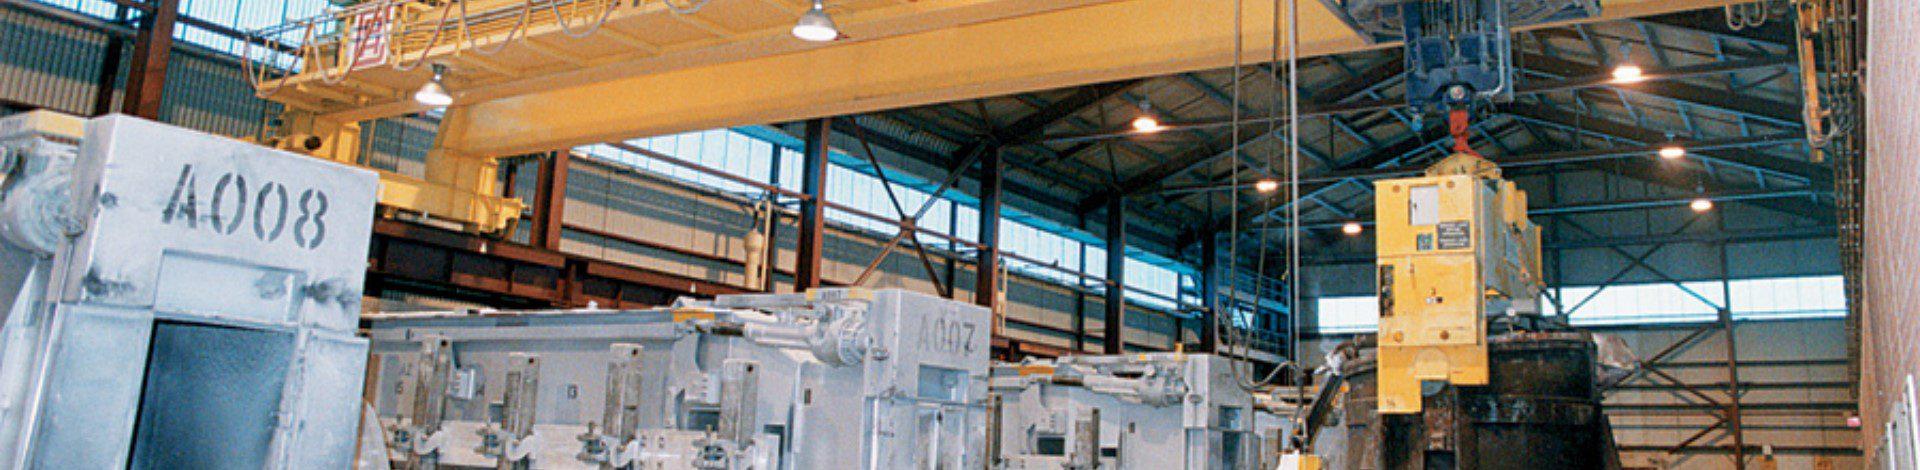 custom-made-overhead-crane-aluminium